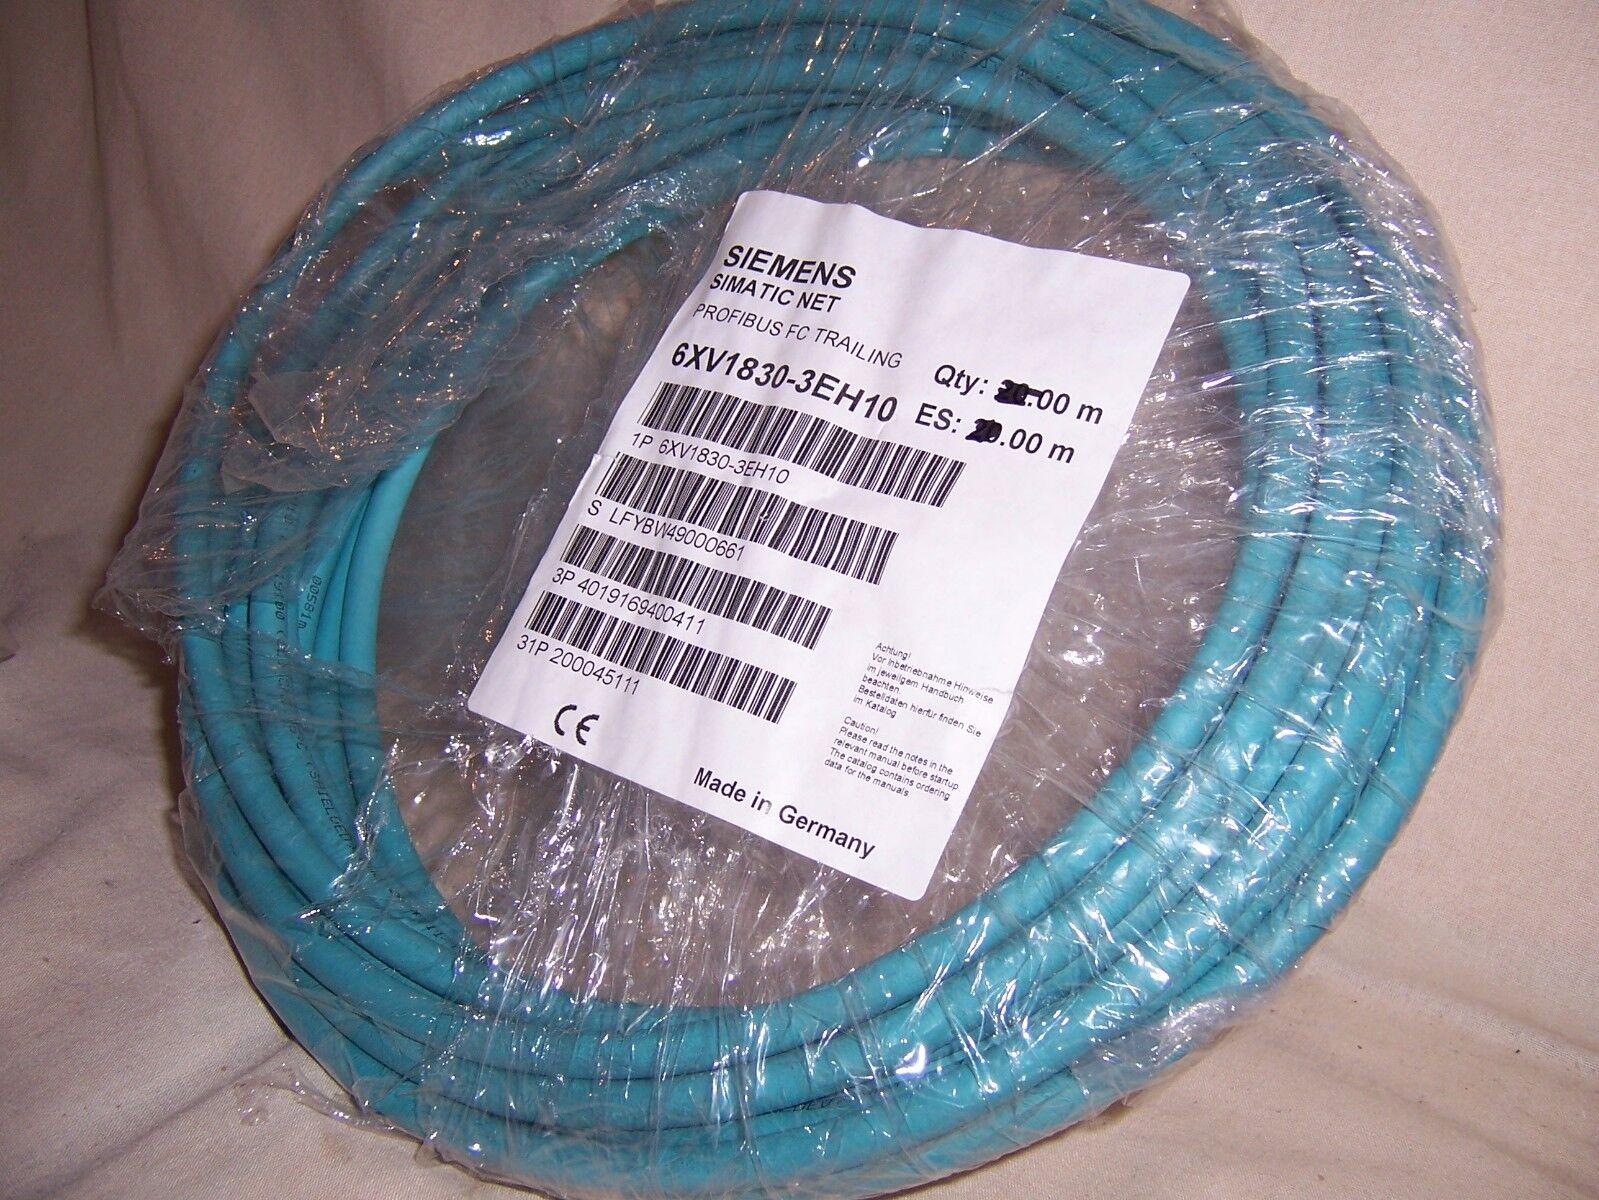 6AV1830-0EH10 Siemens  Cable 2.5/M **New **6AV1  830-0EH10